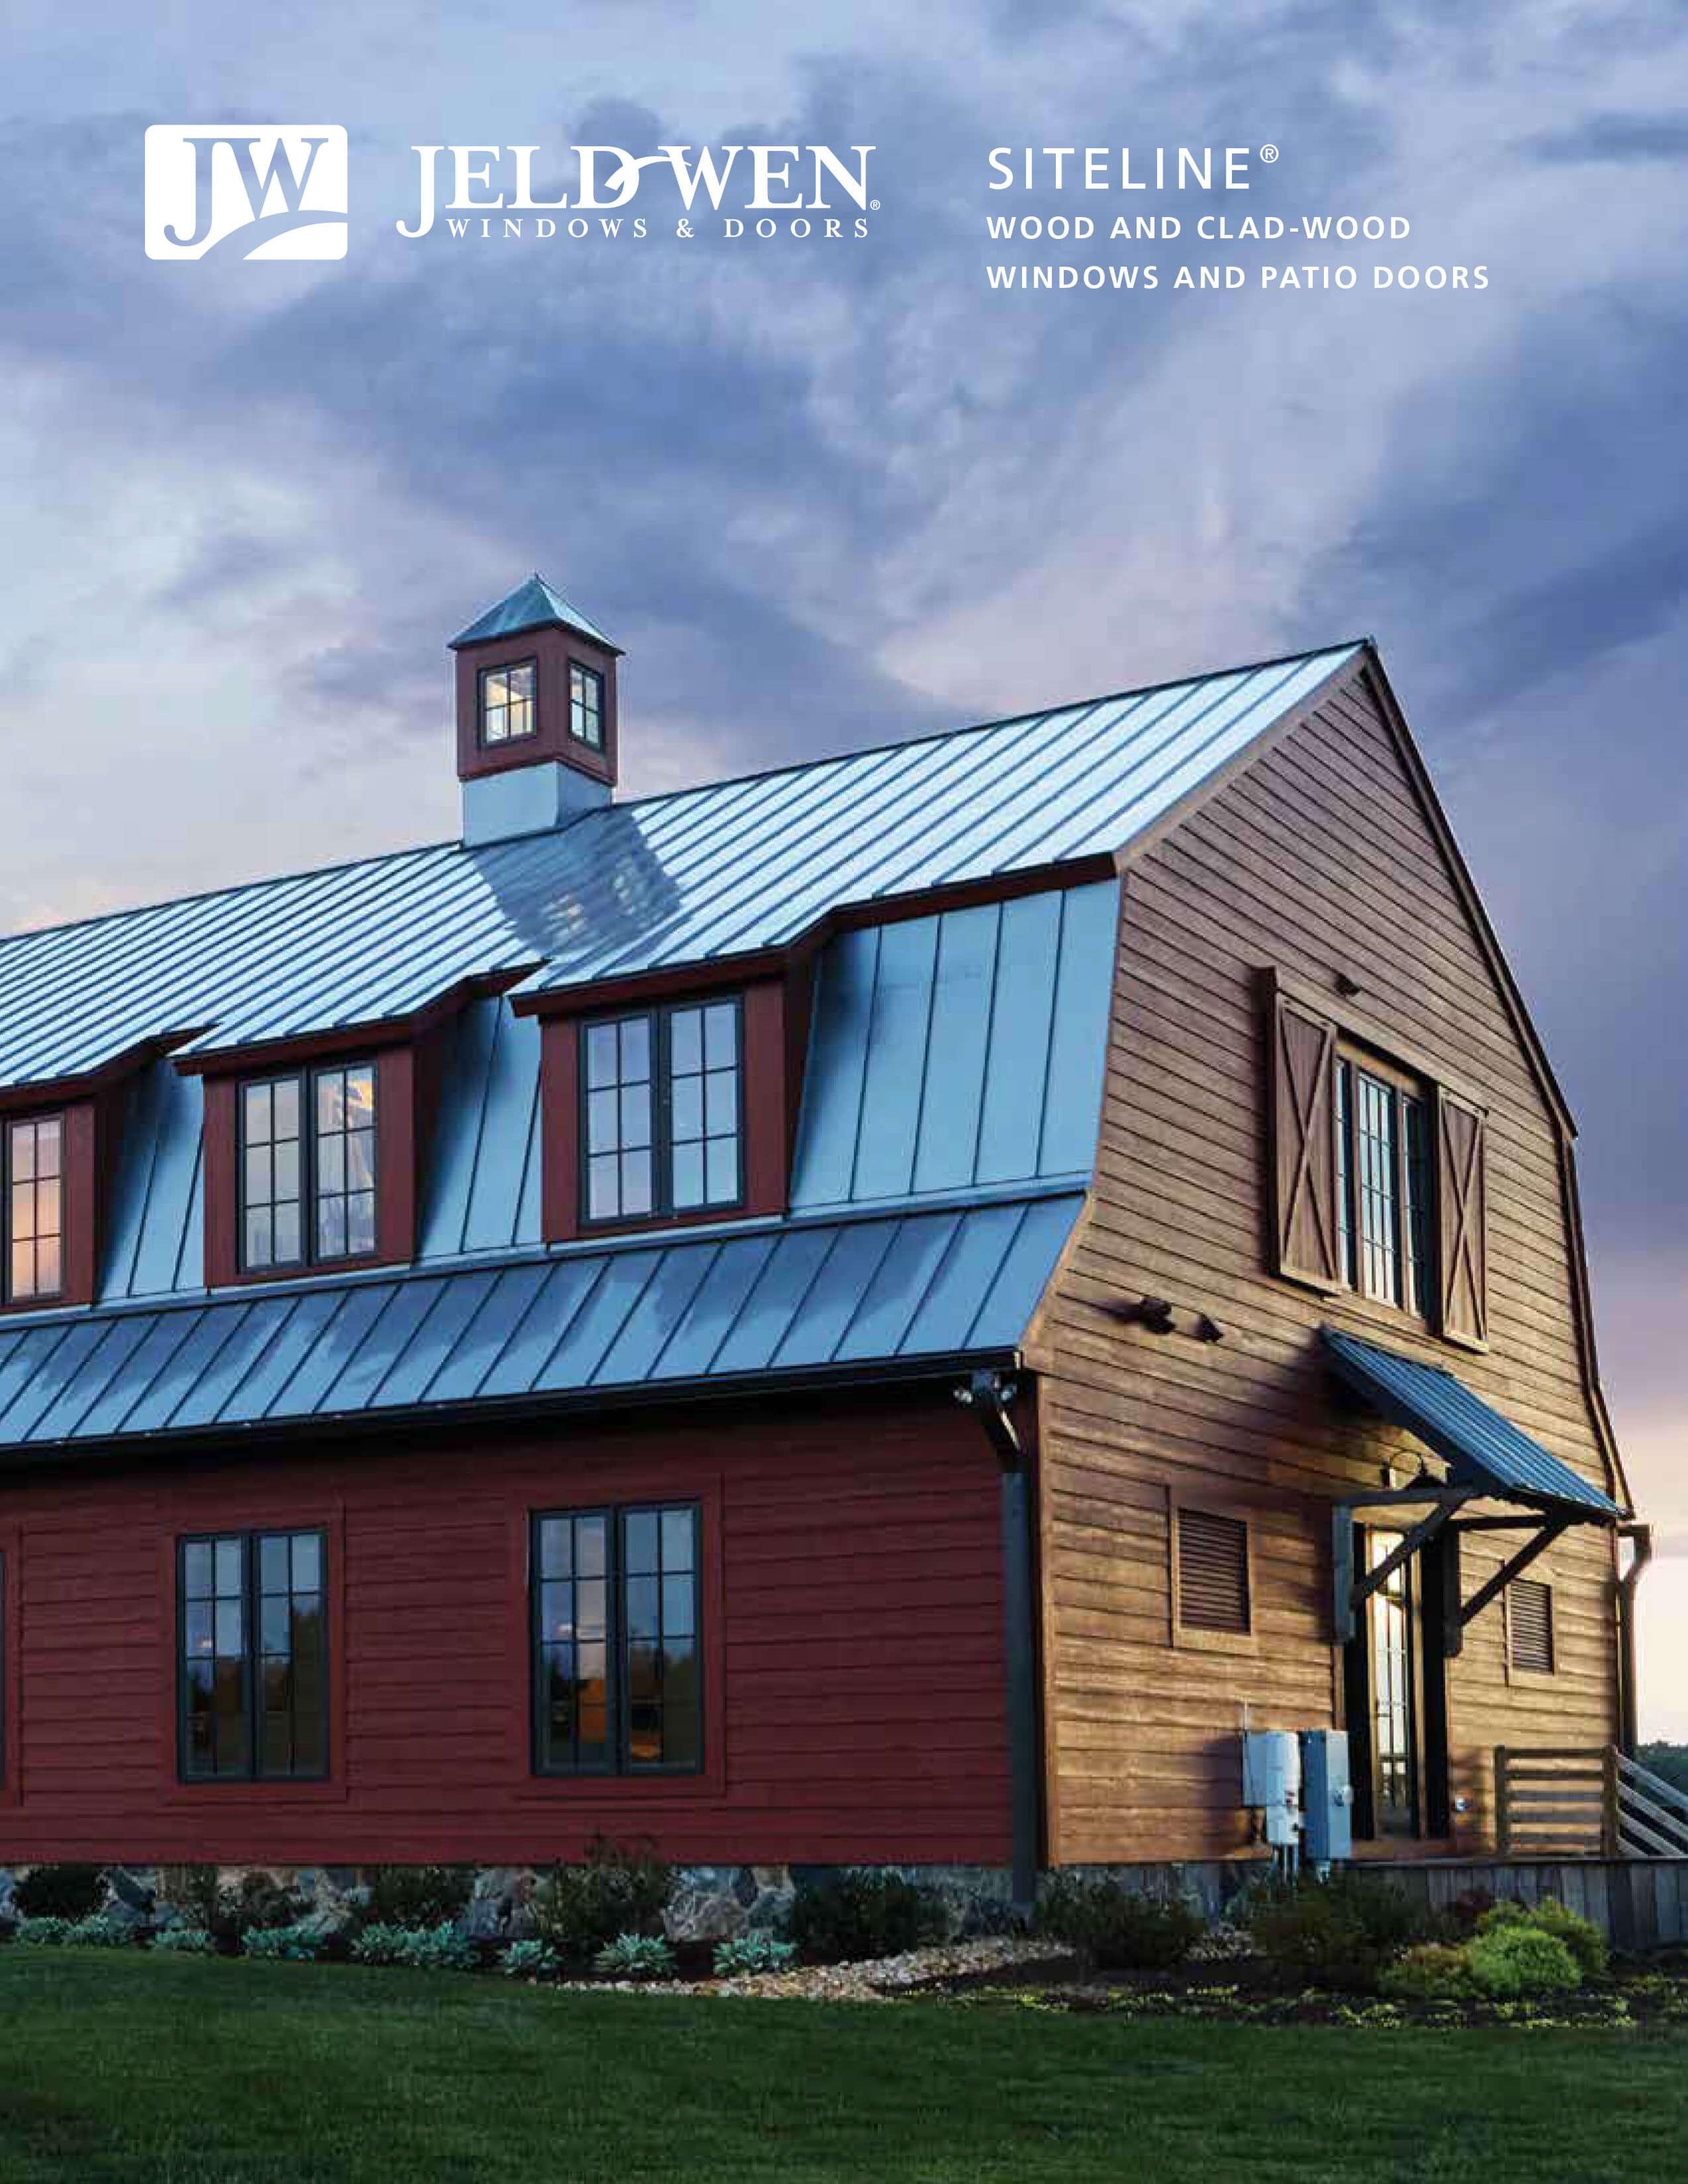 jeld wen siteline wood and wood clad windows catalog 2021 1